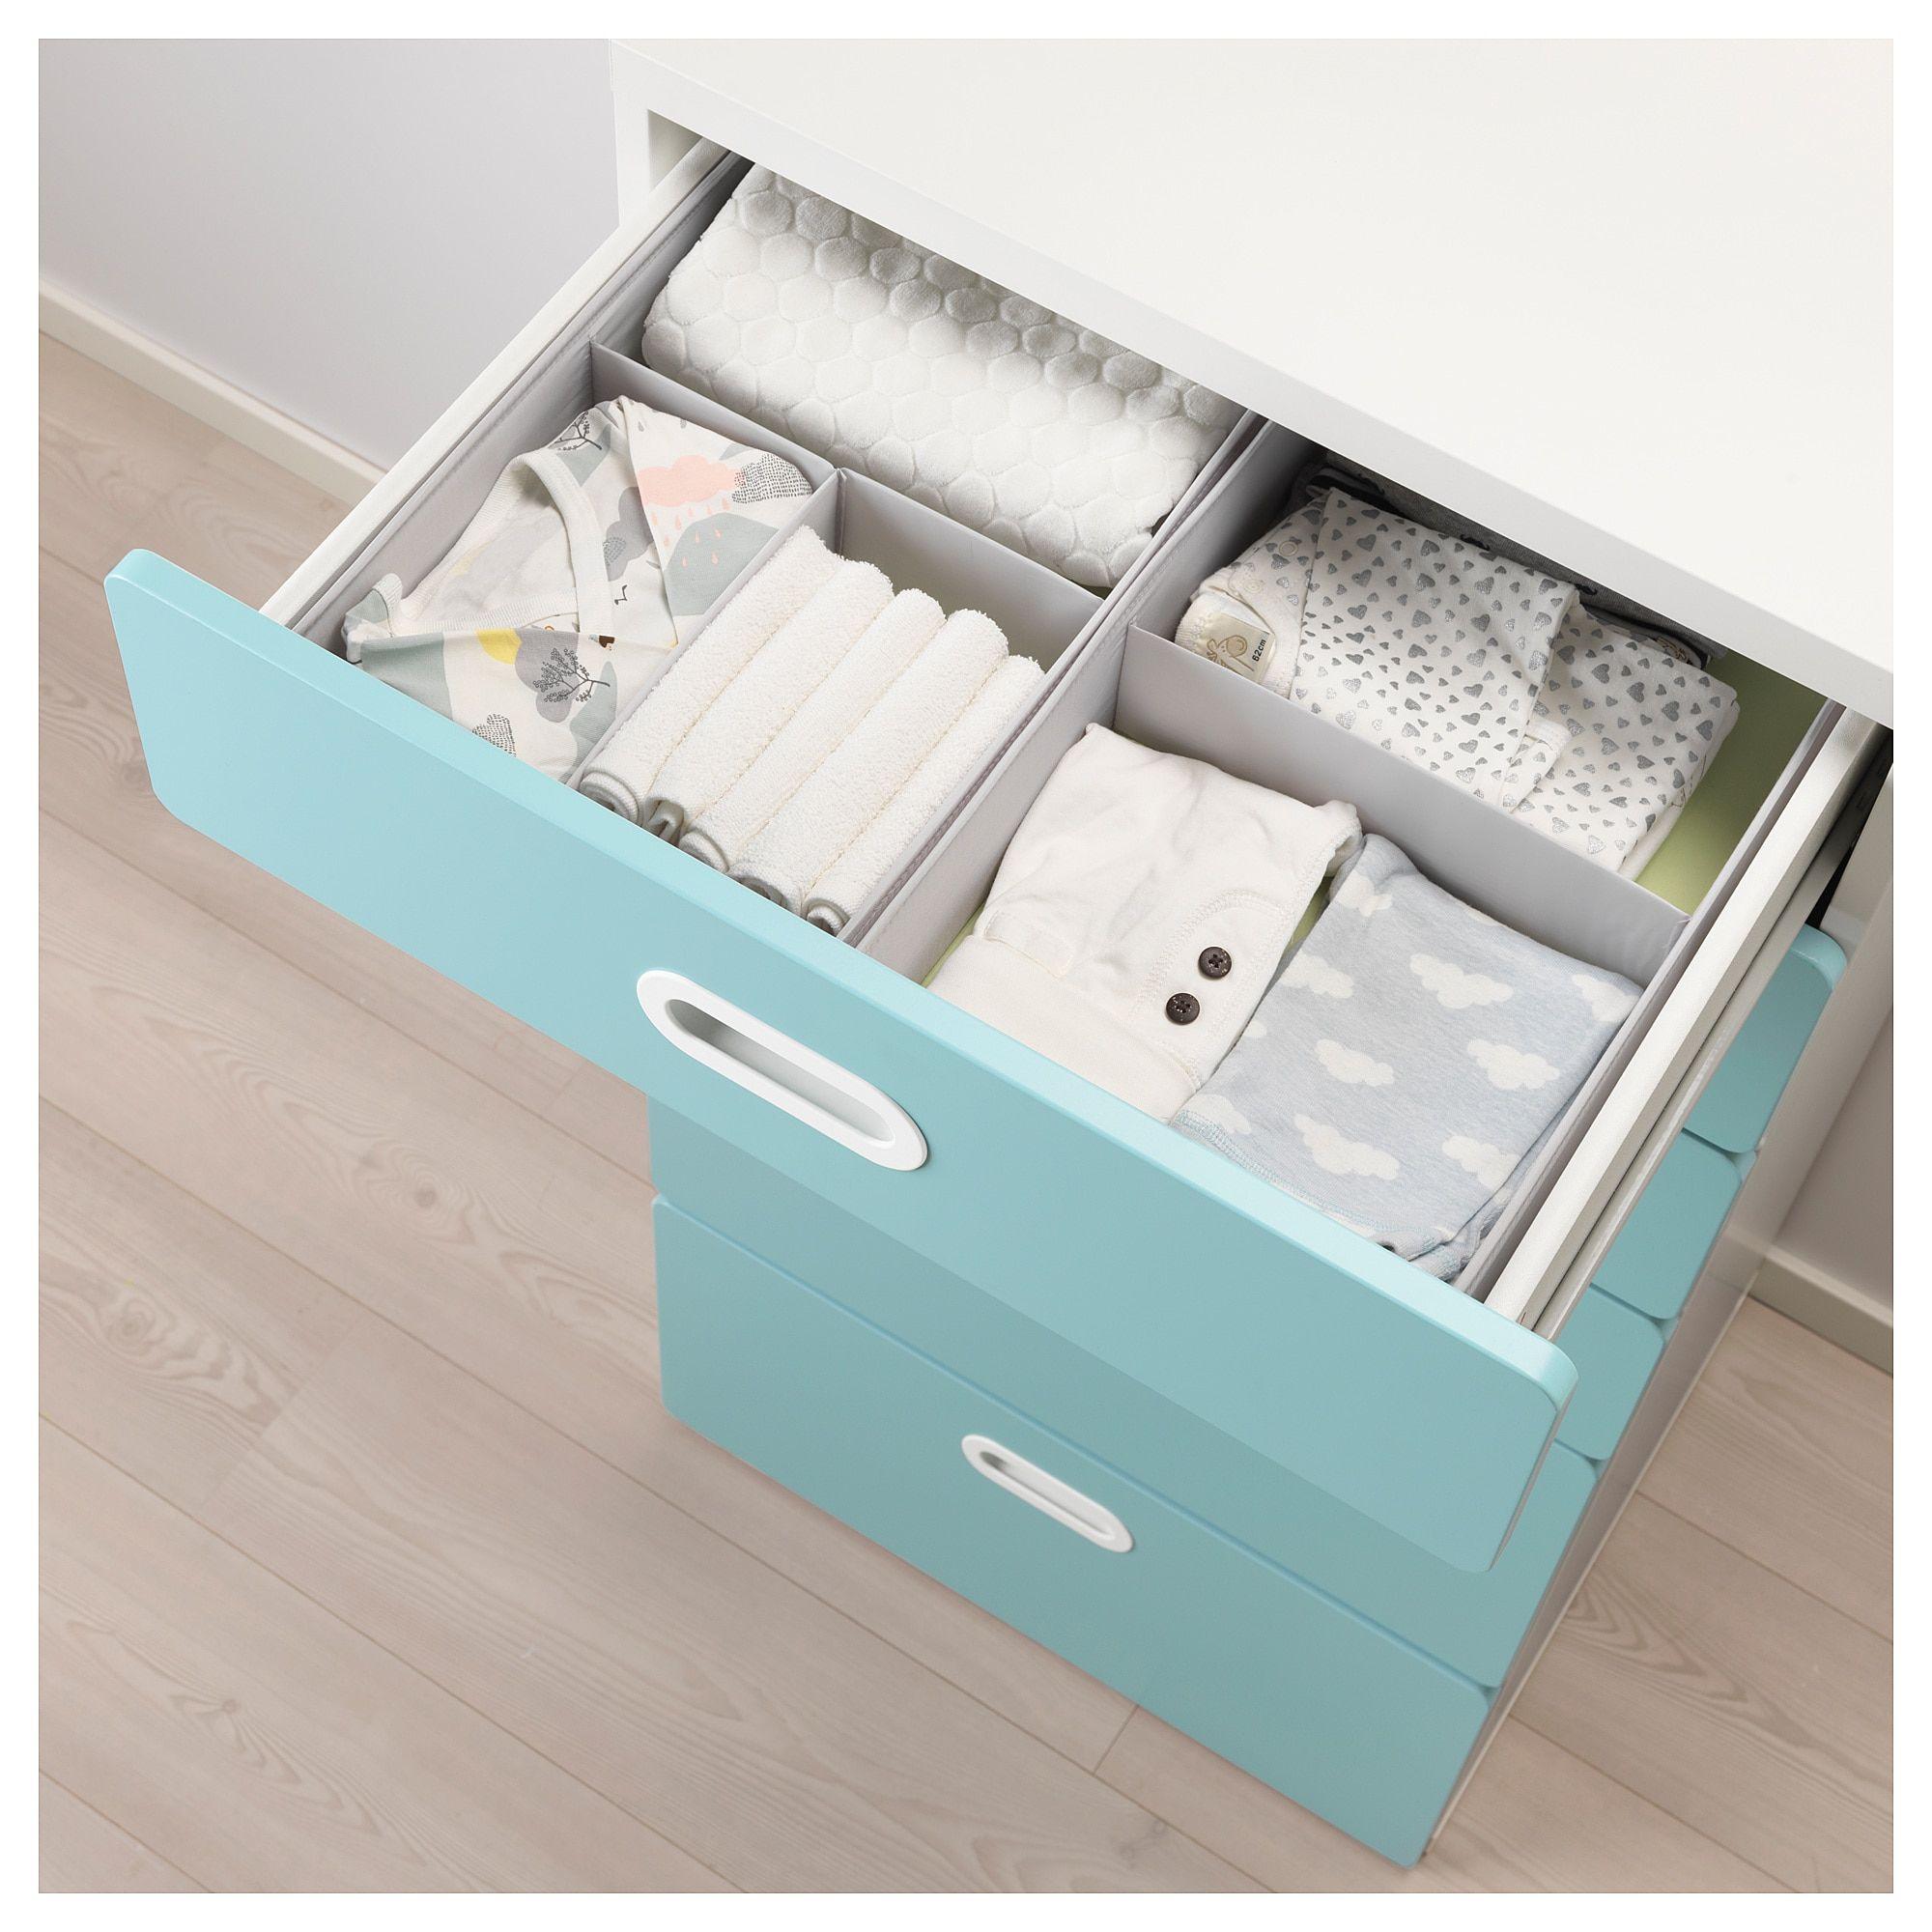 Mini Cassettiera Fai Da Te ikea - stuva / fritids 6-drawer chest | 6 drawer chest